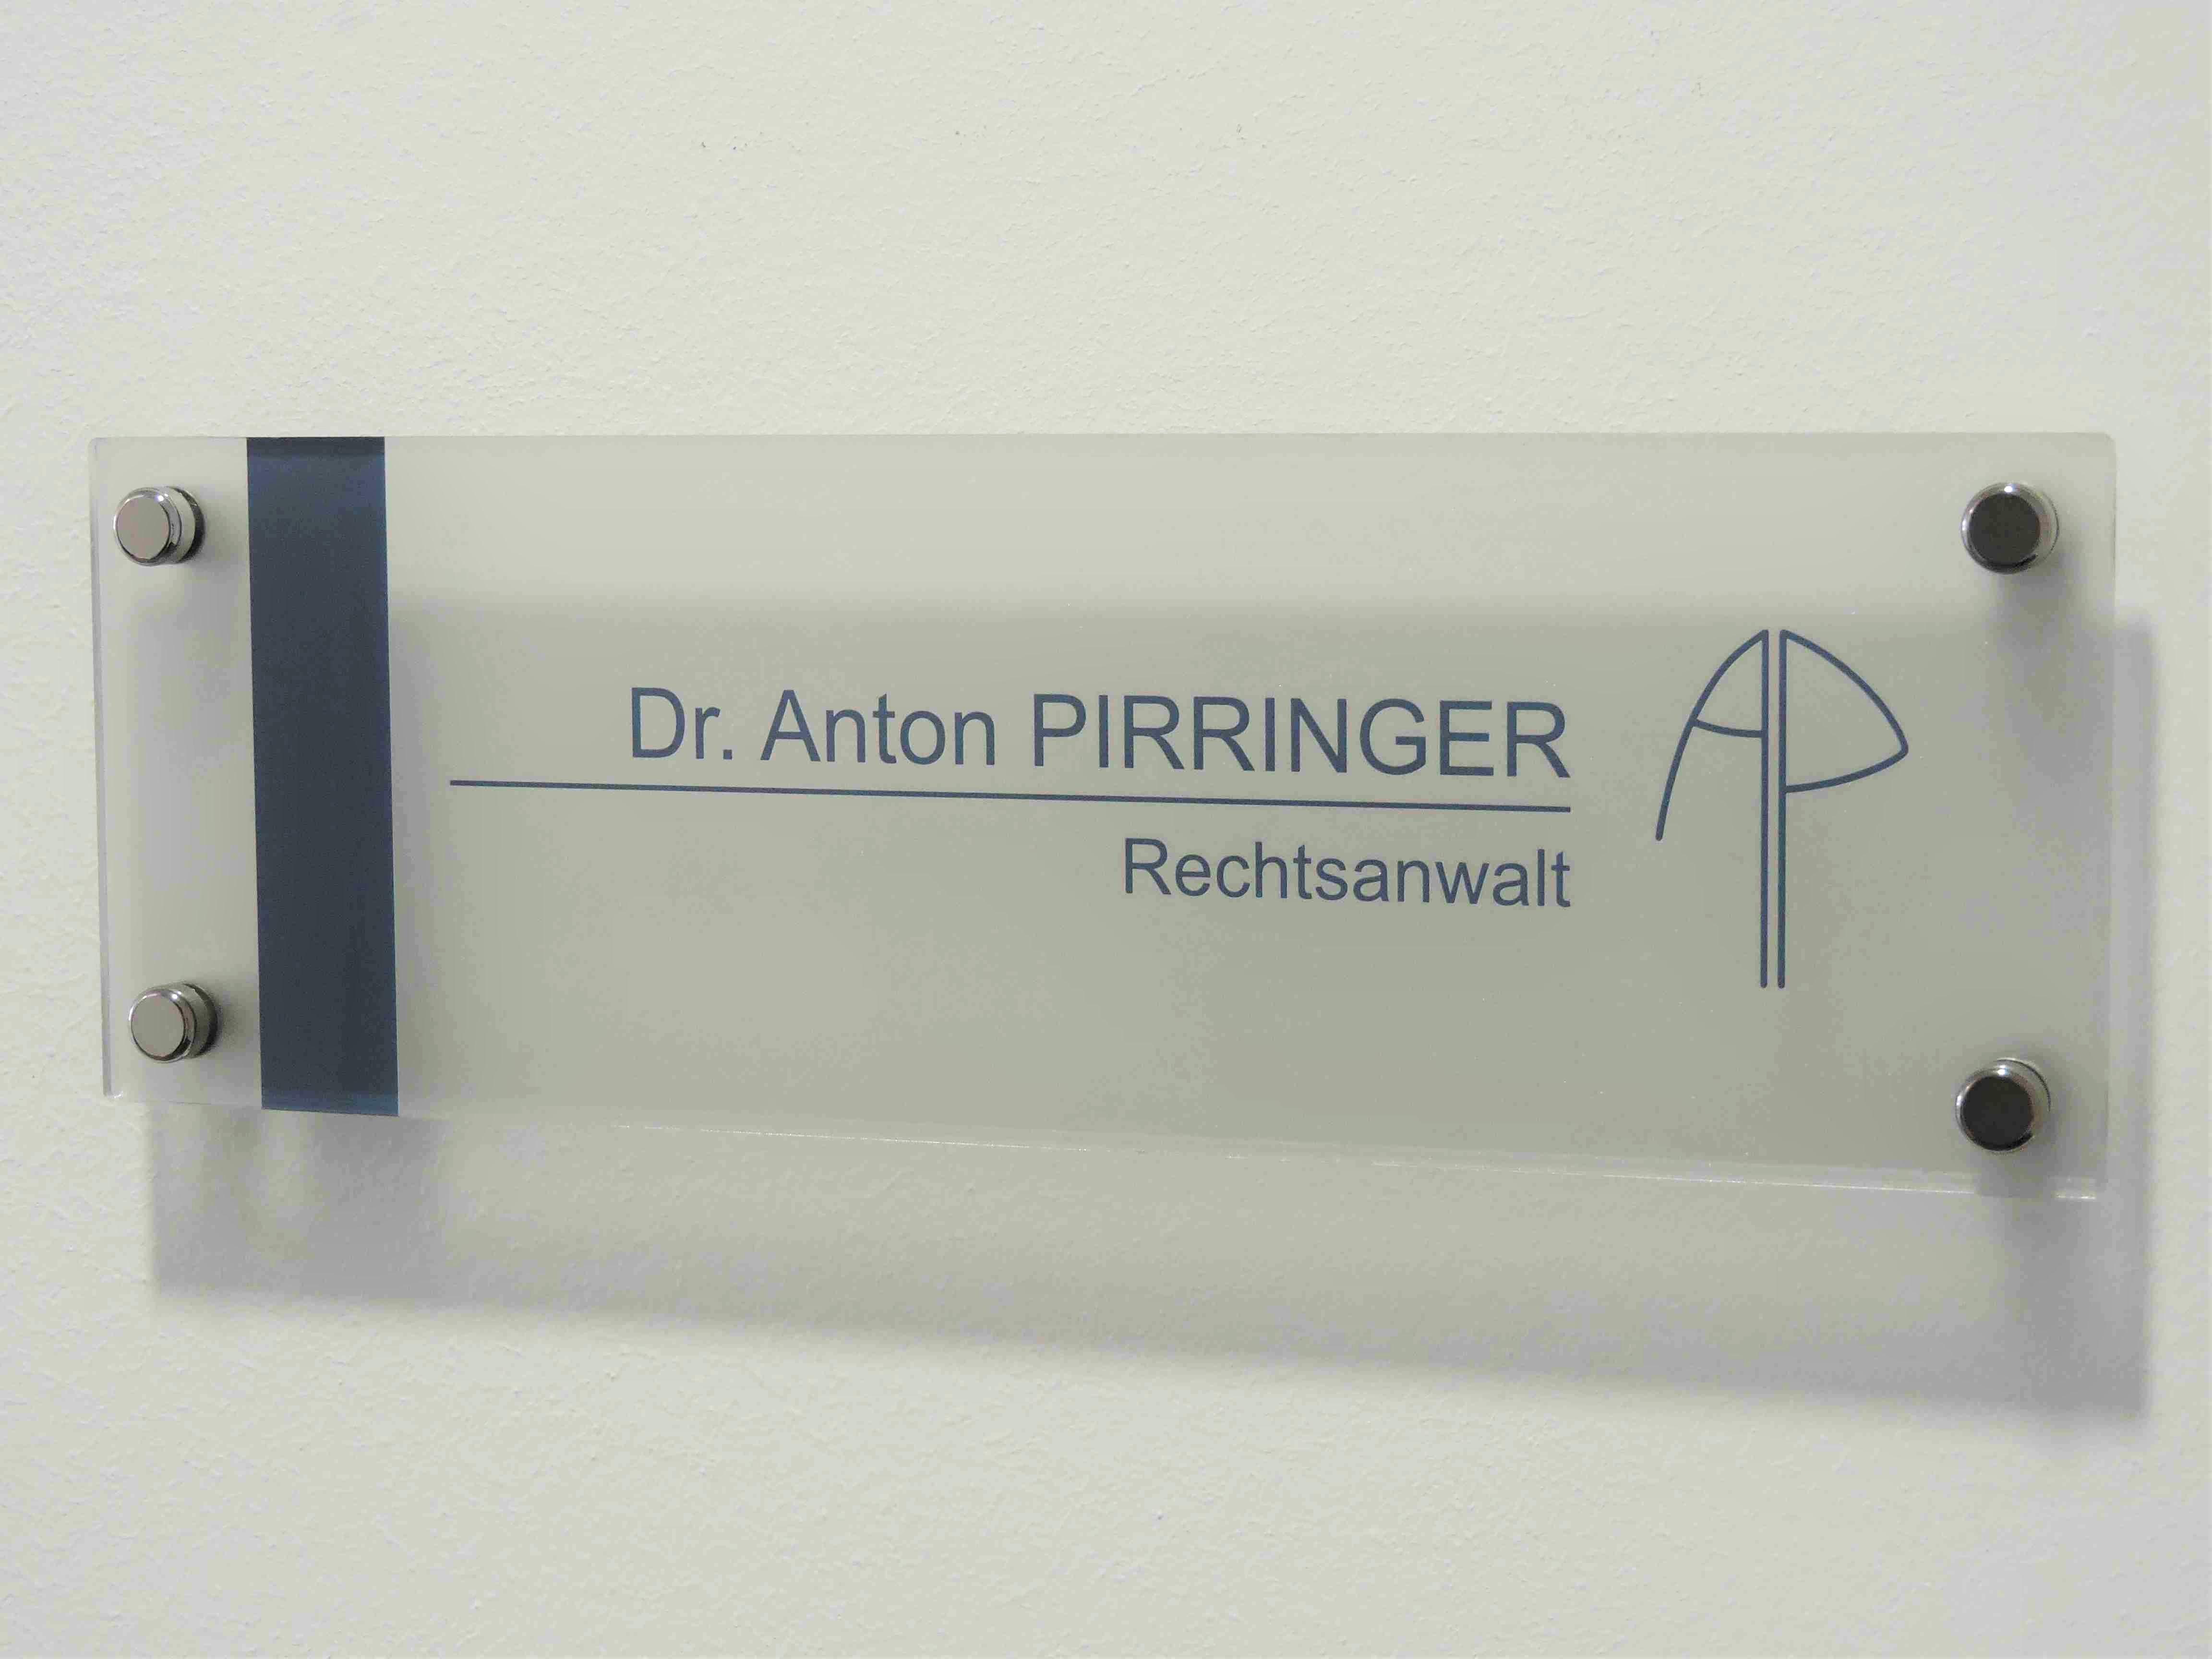 Türschild Anwalt Dr. Anton Pirringer 2460 Bruck an der Leitha 2413 Berg Rechtsanwalt